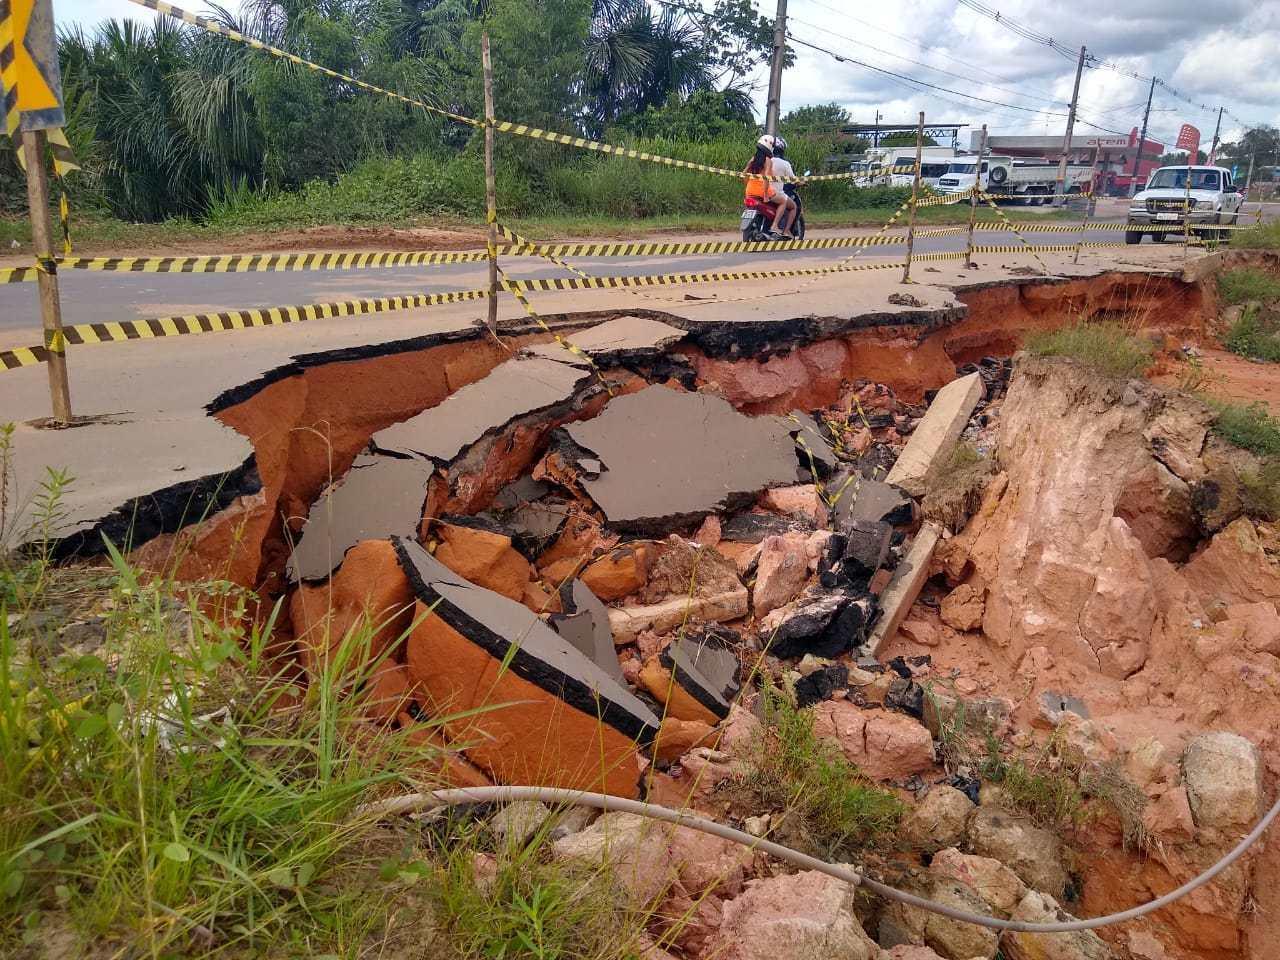 Deracre vai interditar trecho da Estrada do Aeroporto de Cruzeiro do Sul por dez dias